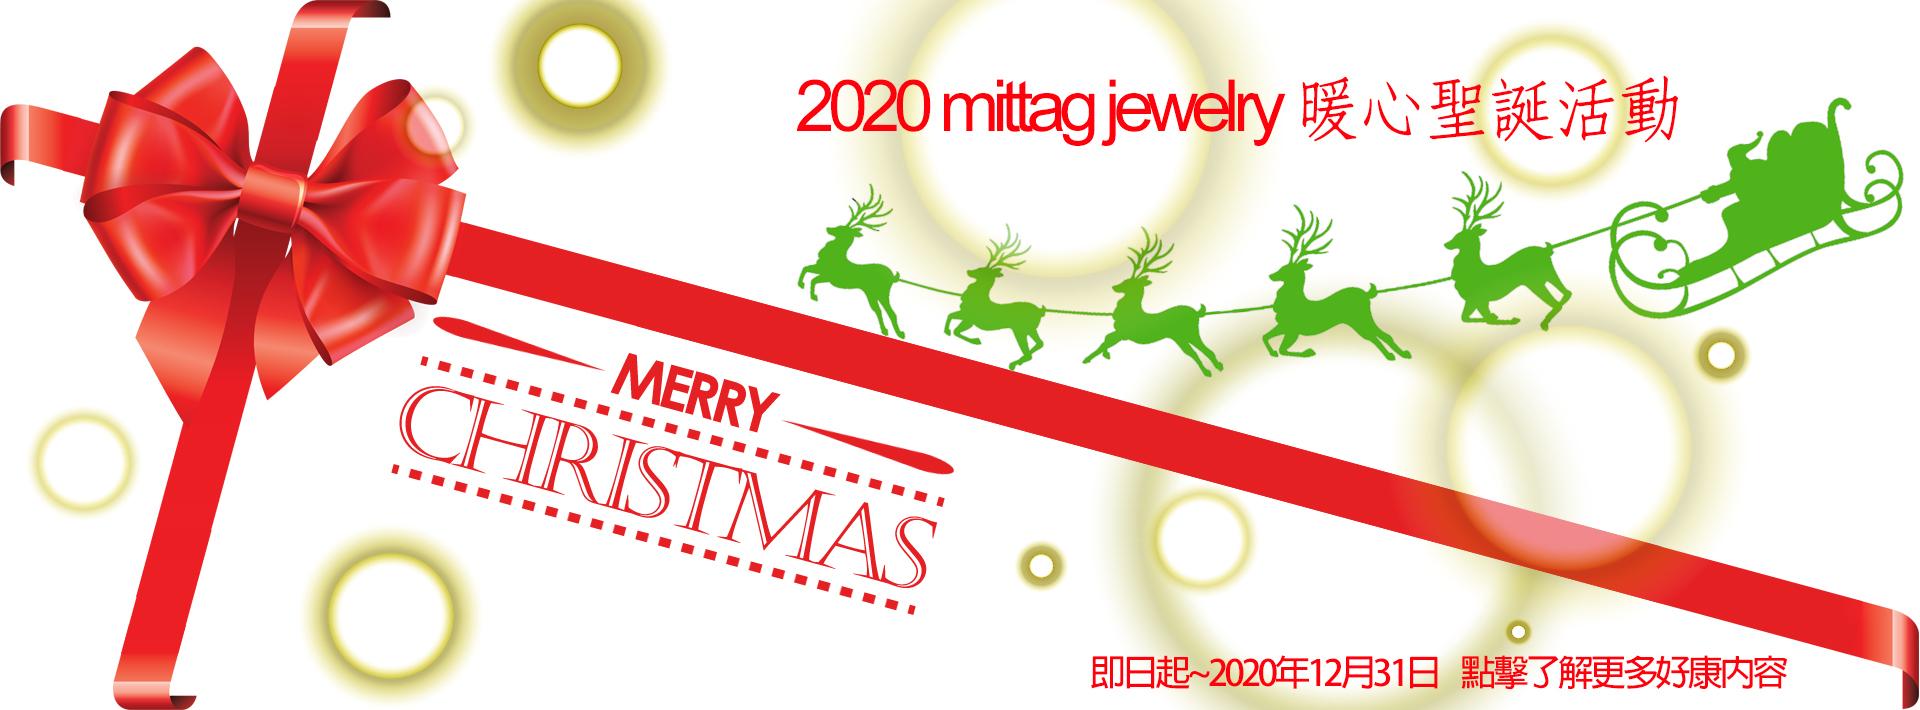 2020 mittag jewelry 暖心聖誕活動